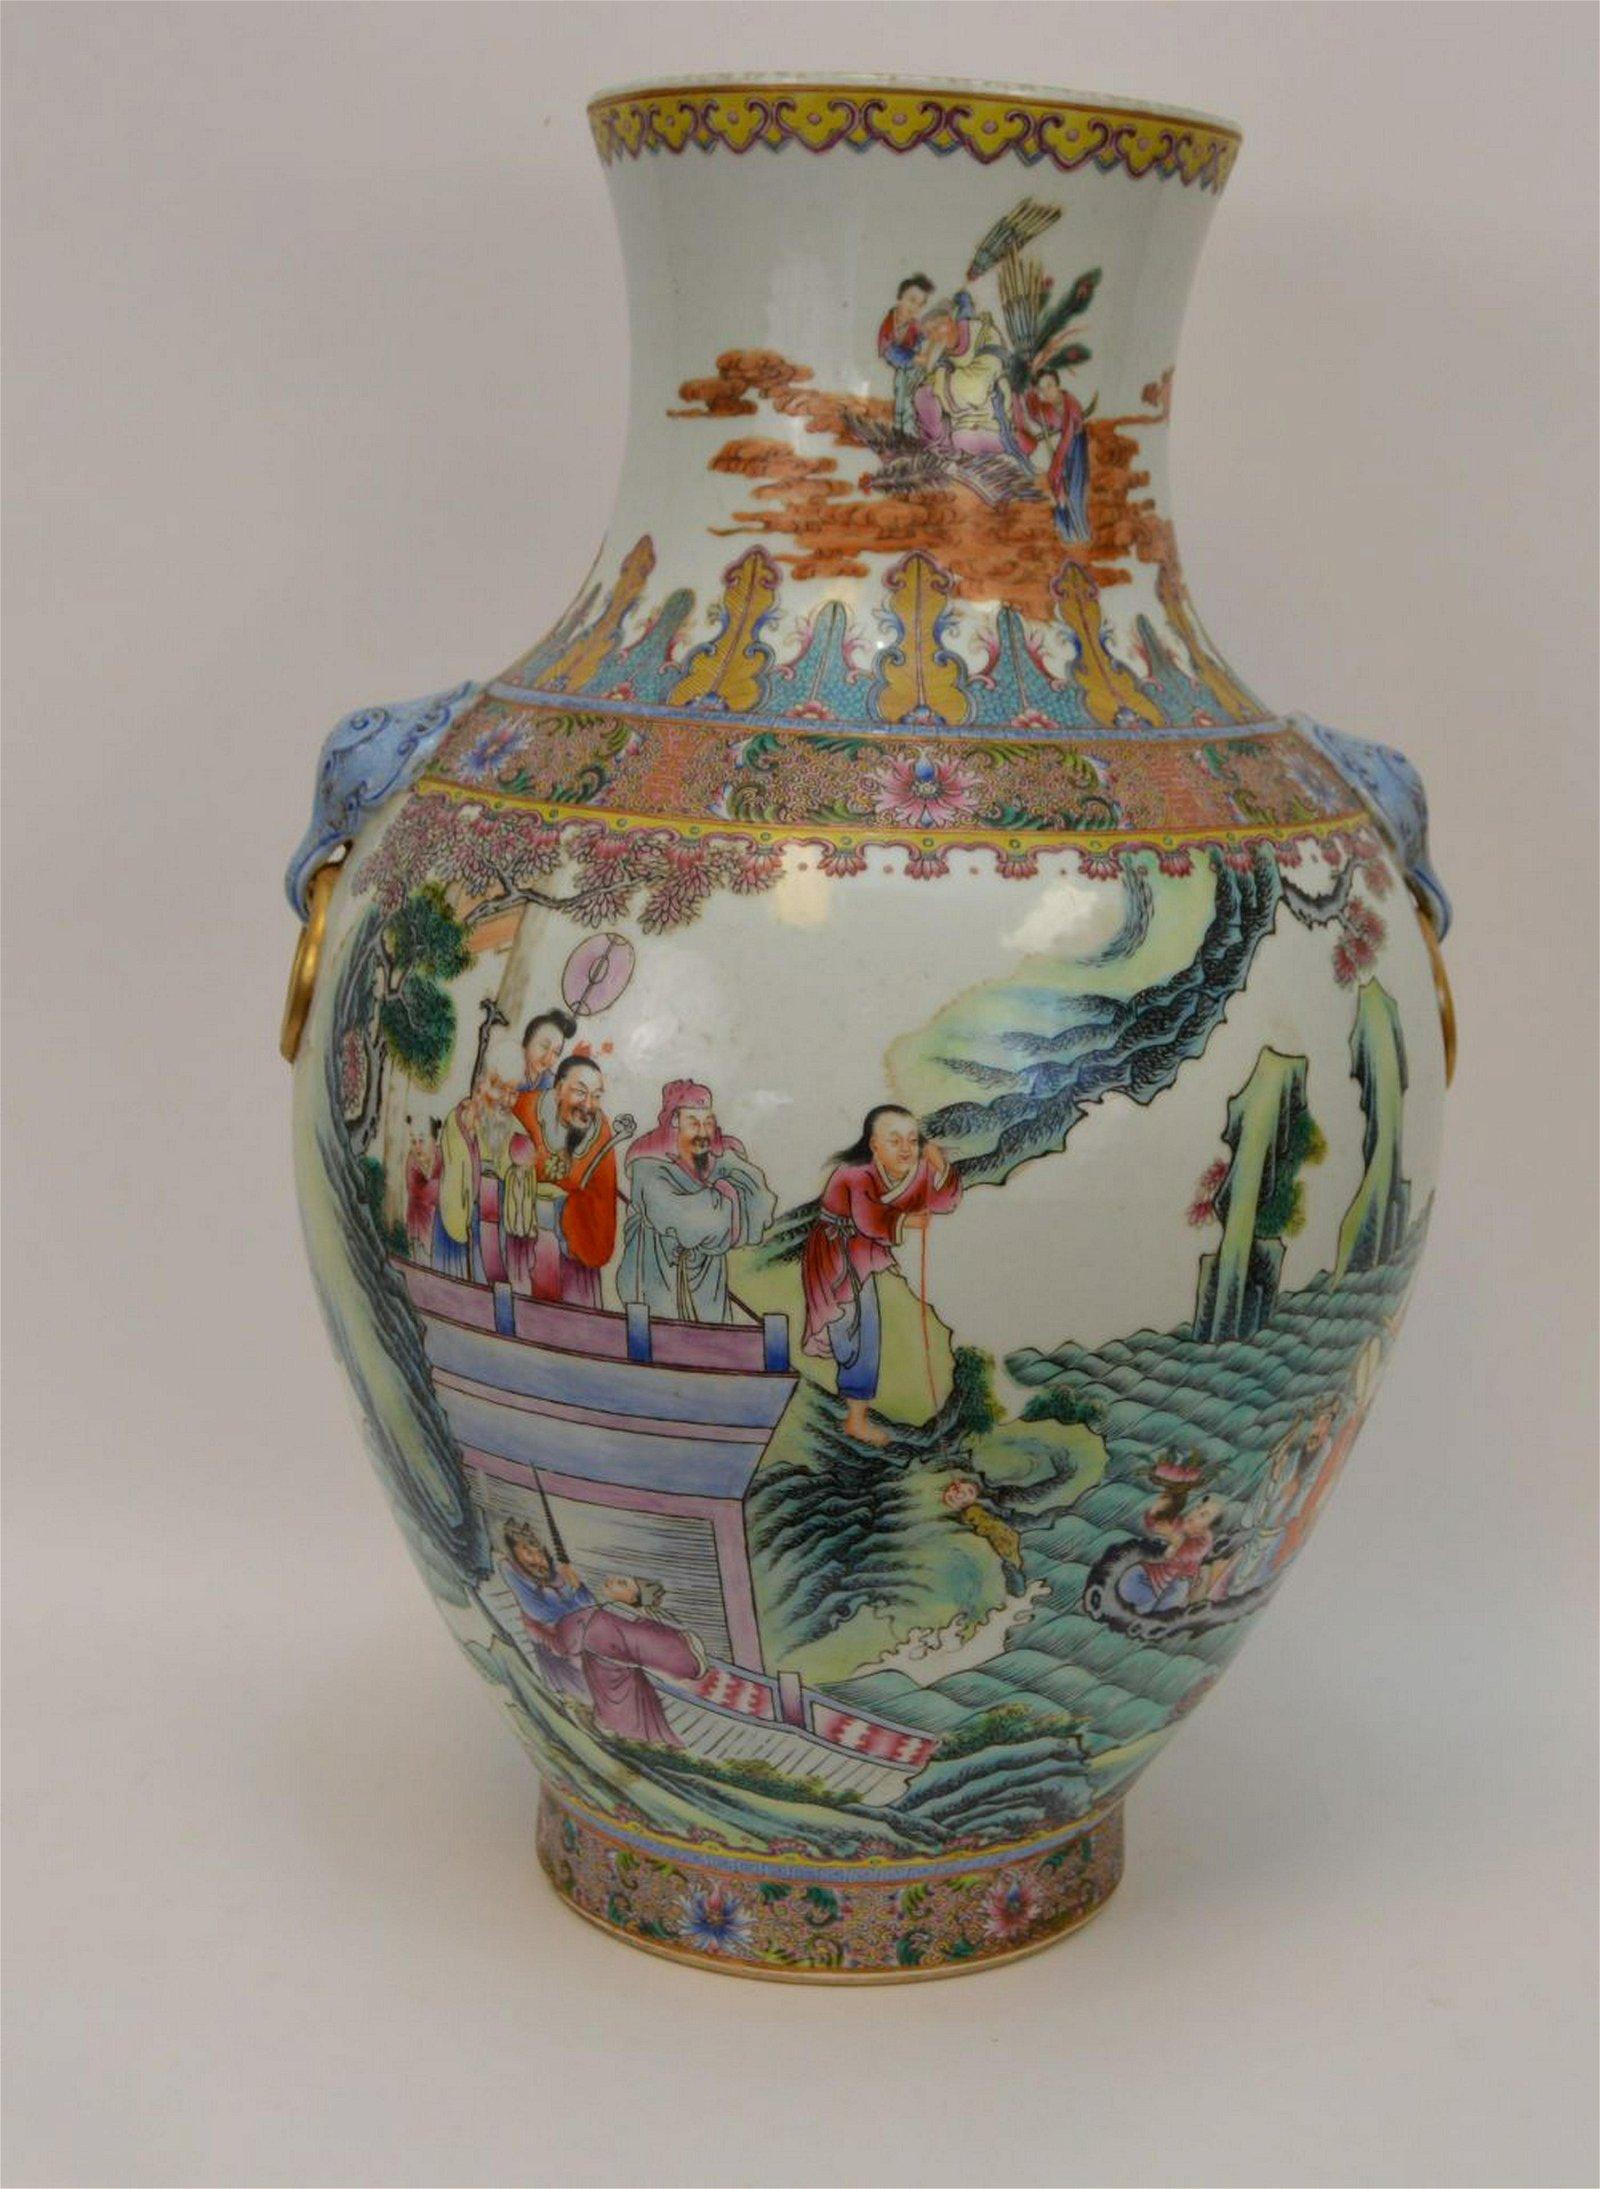 Large Early Chinese Famille Rose Porcelain Vase.